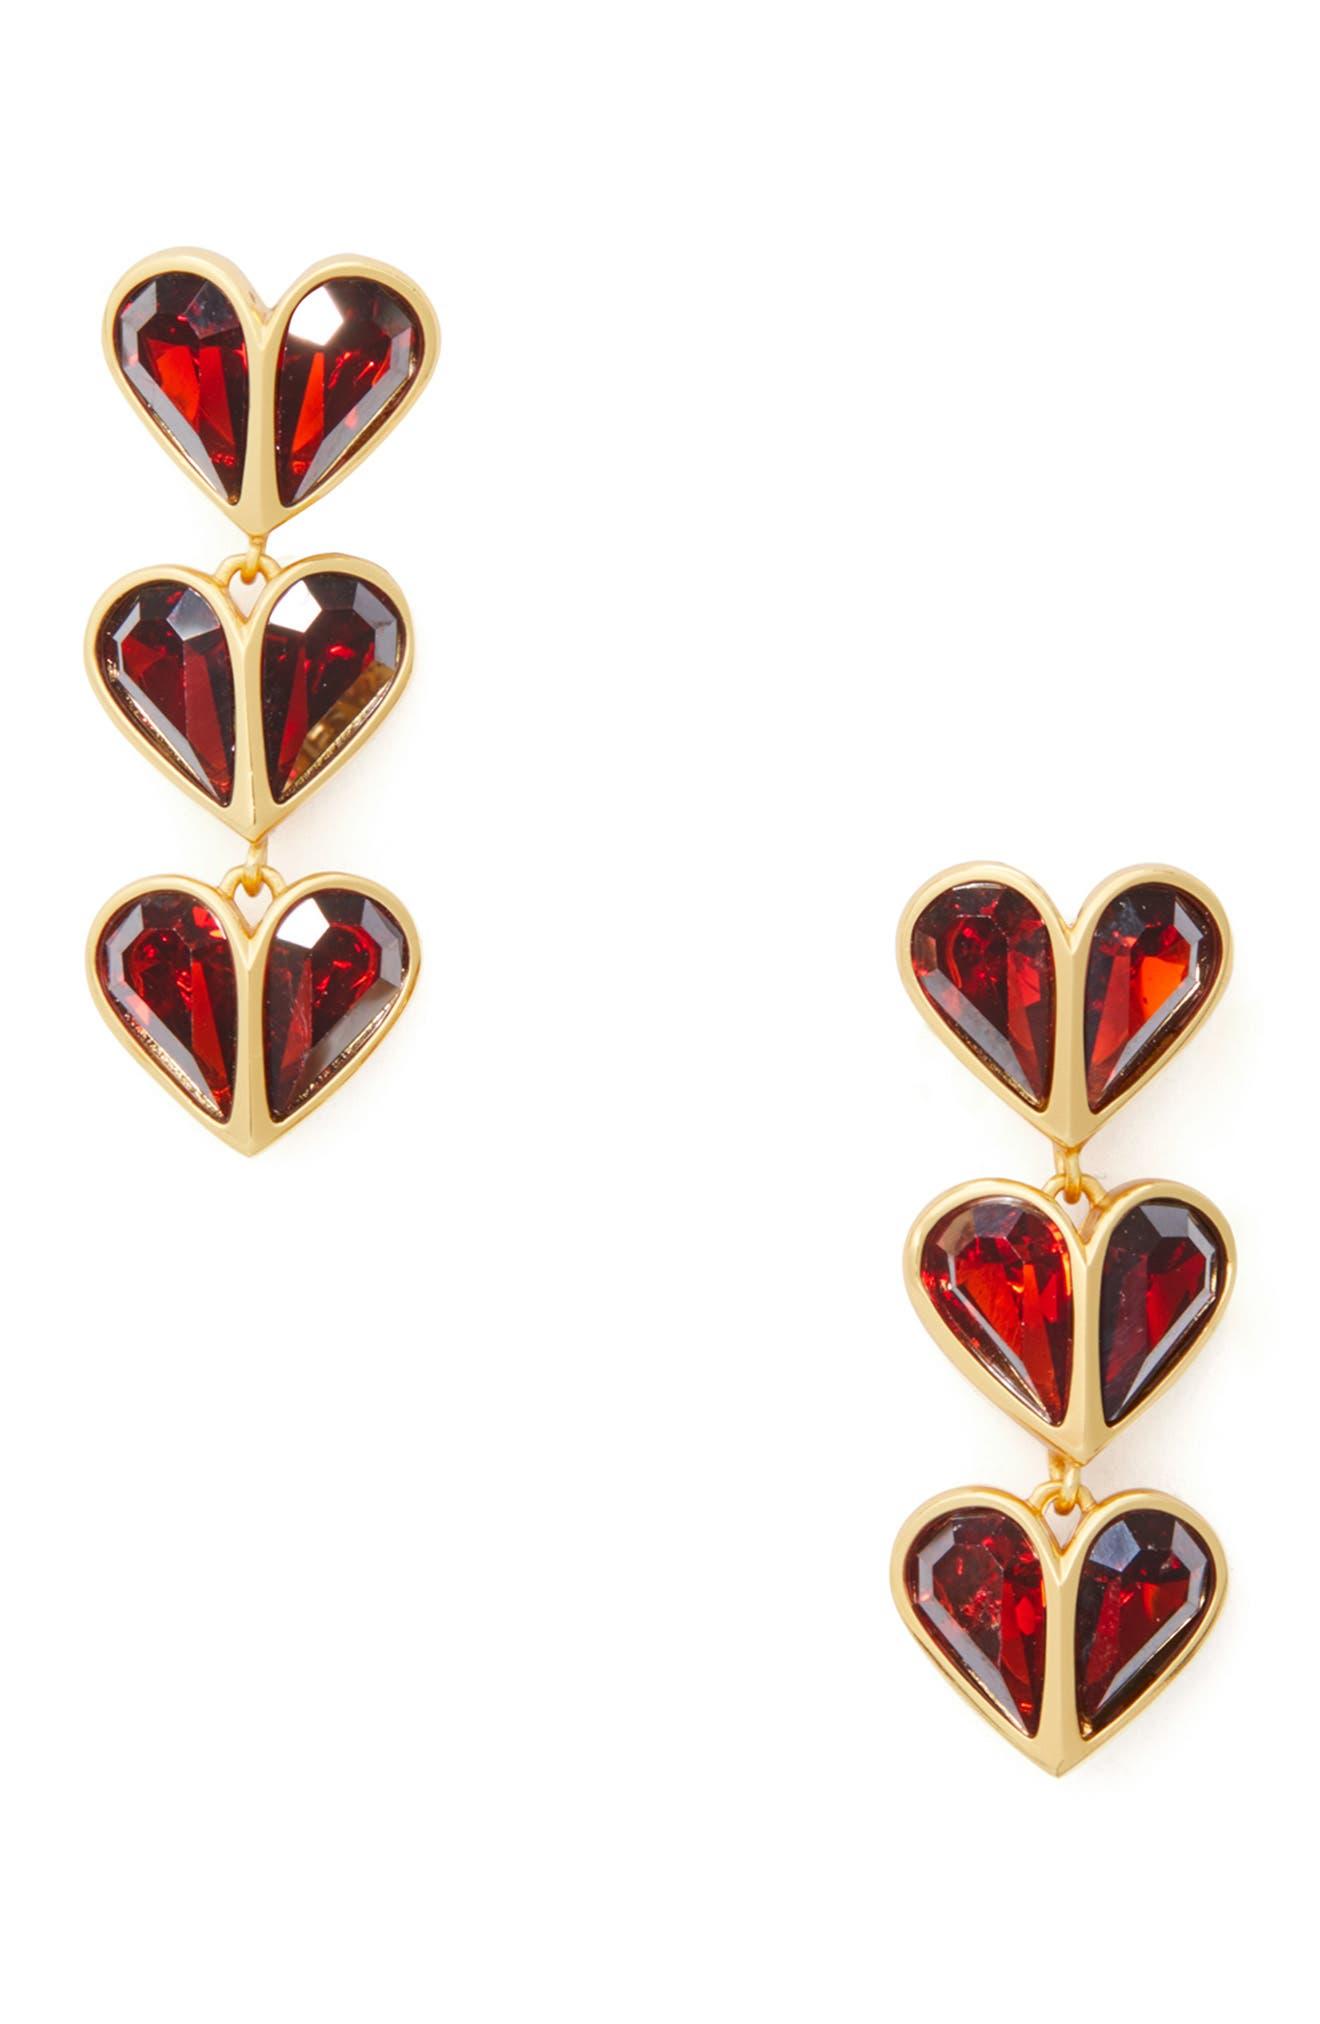 Image of kate spade new york Red CZ Heart Drop Earrings